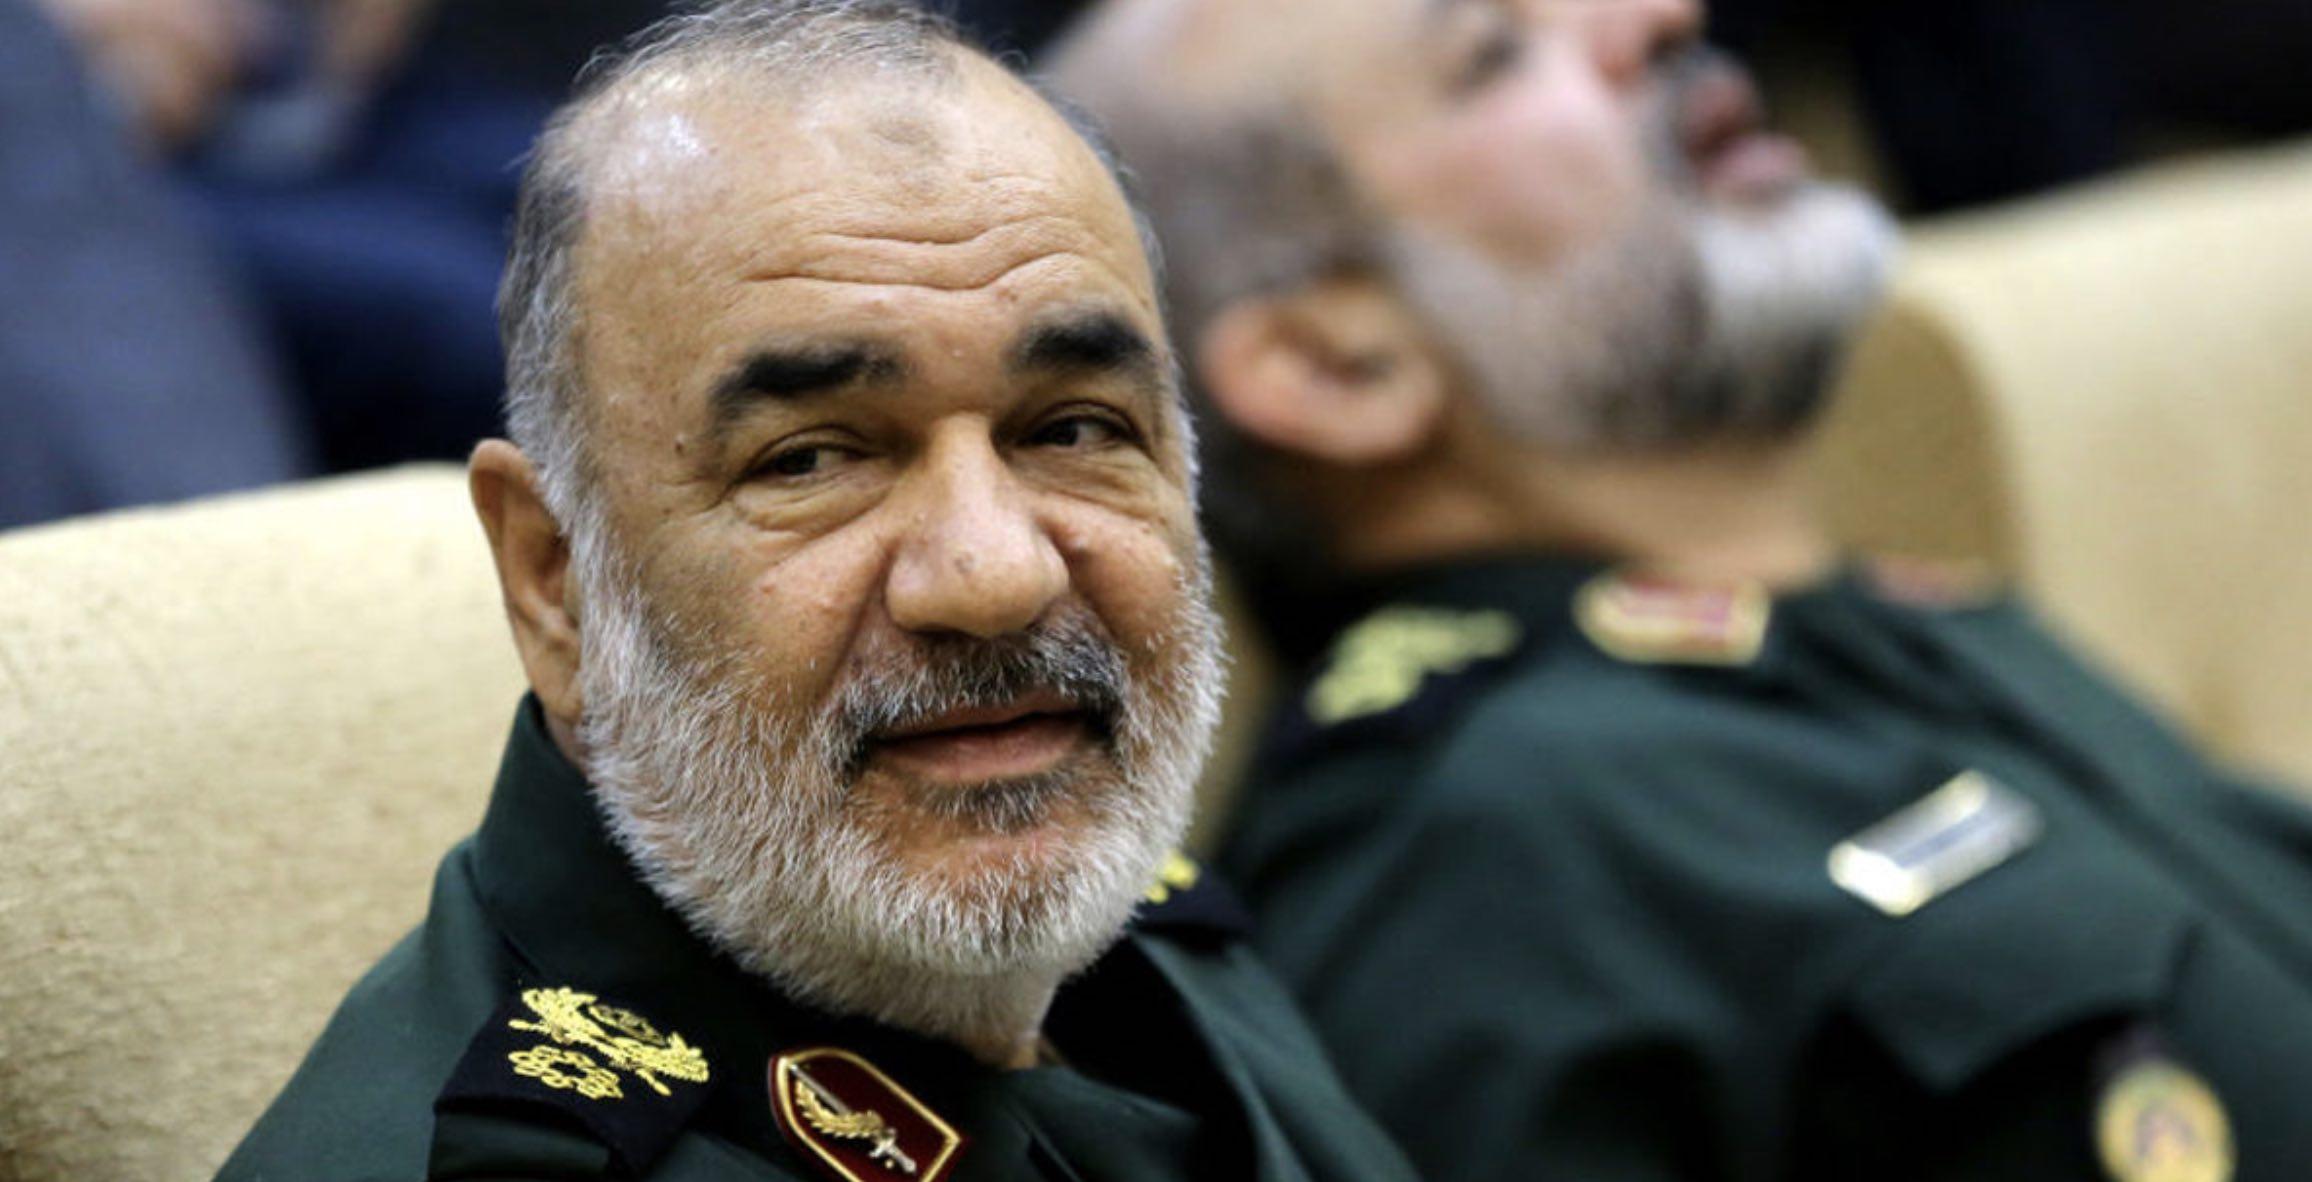 General Hossein Salami